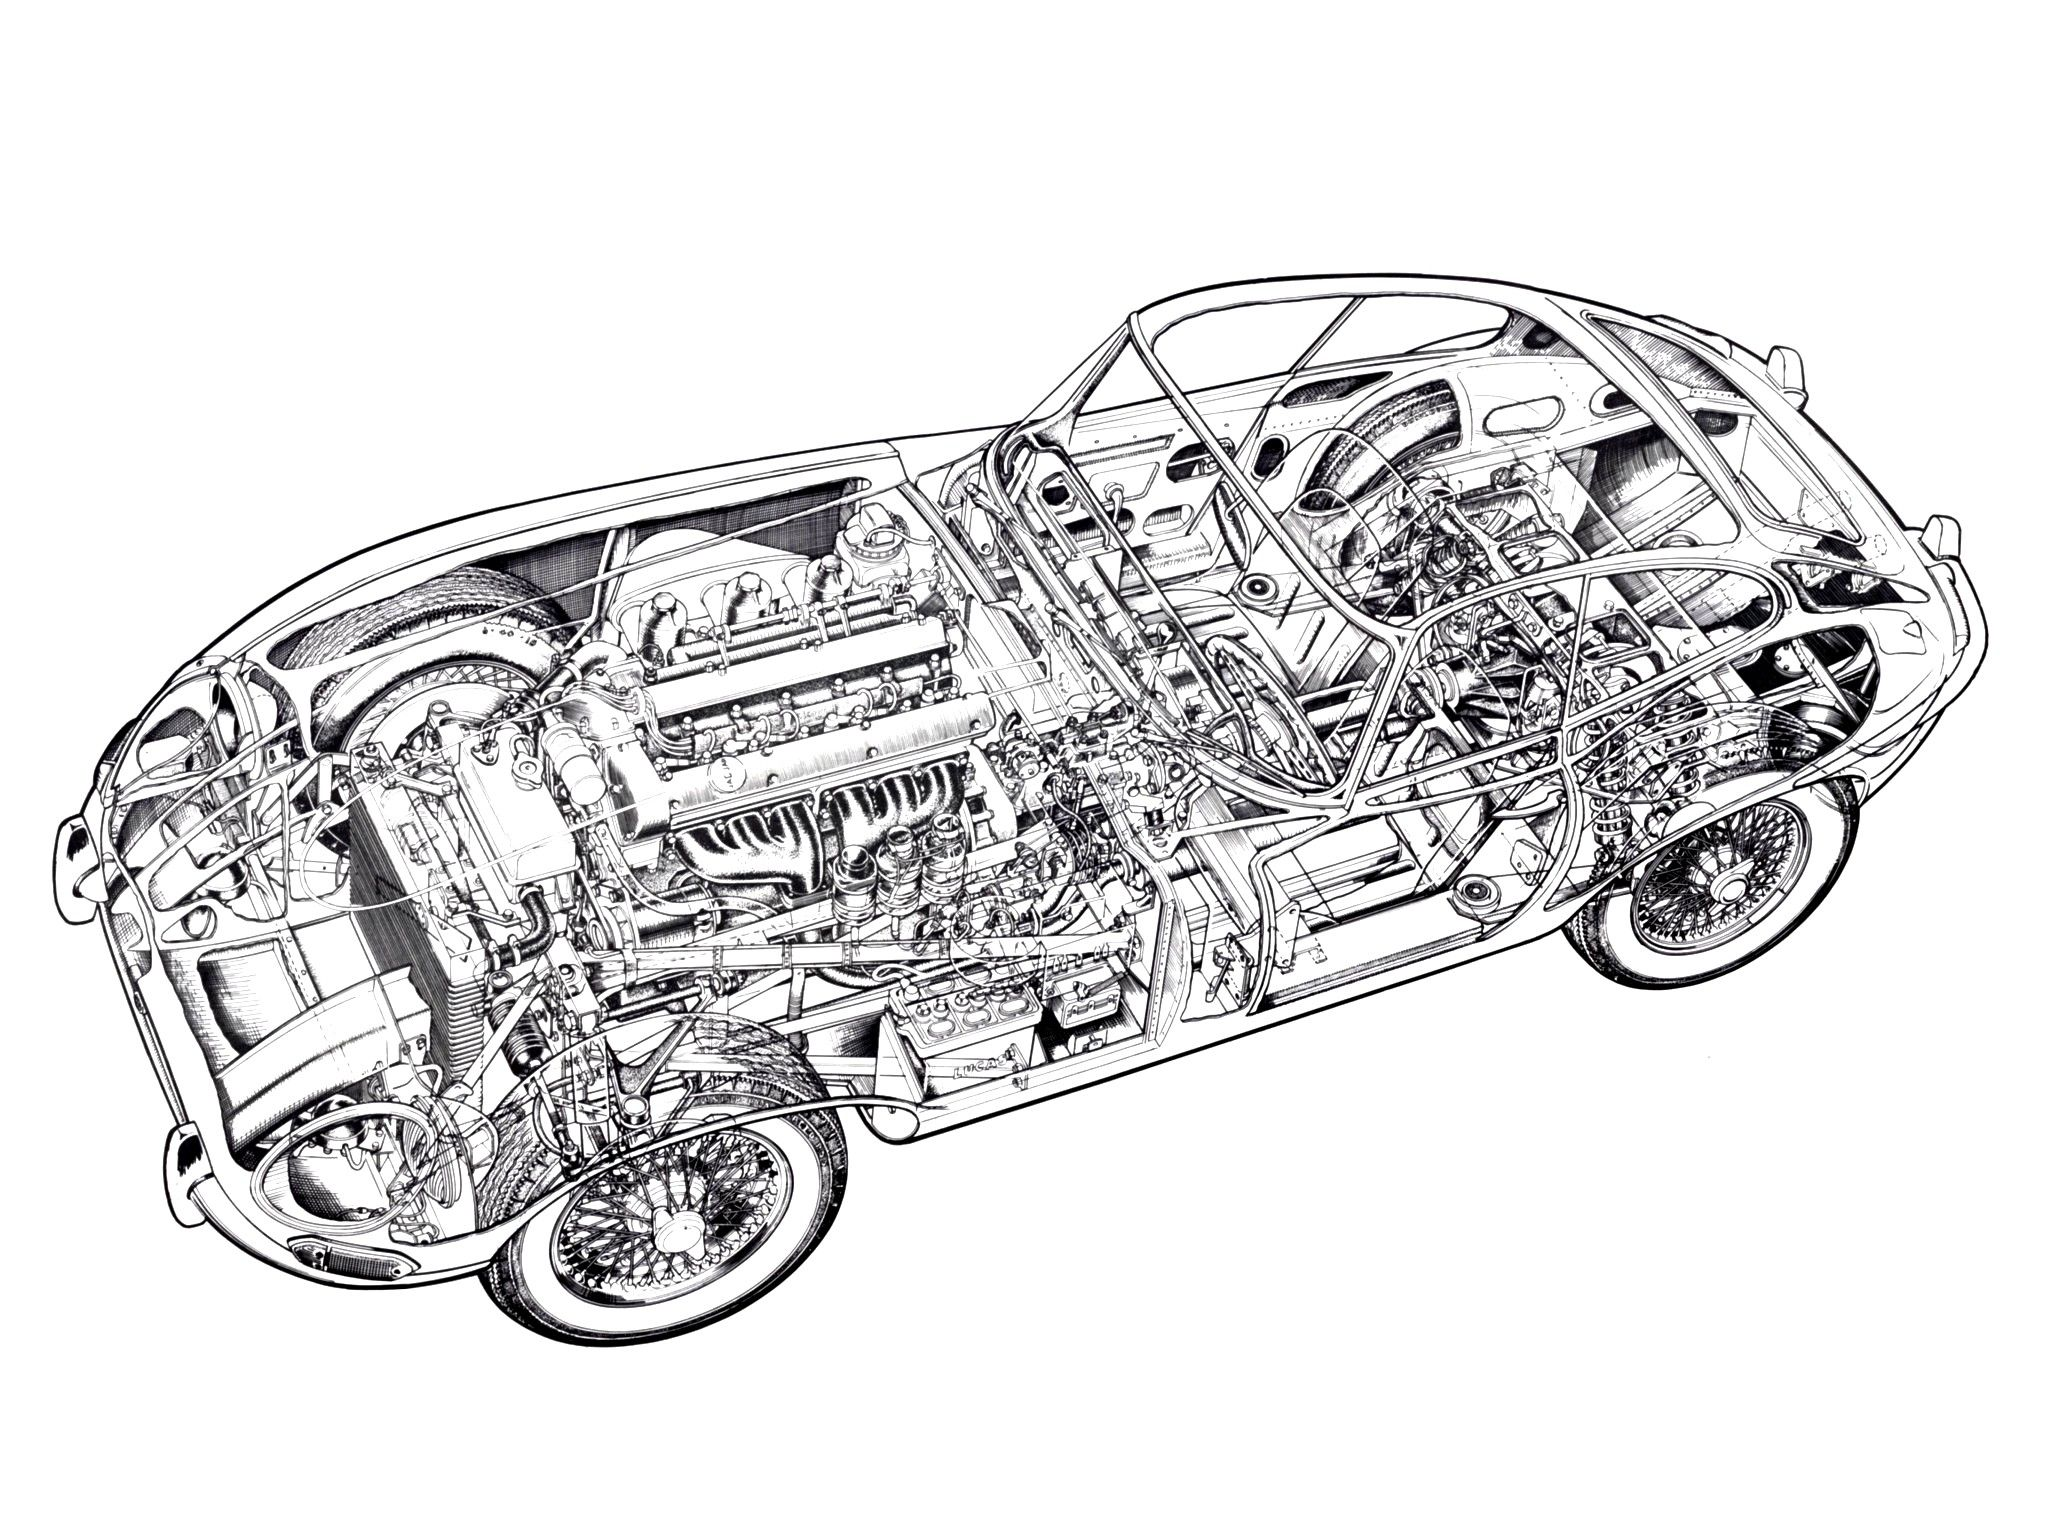 67 Jaguar E Type Fixed Head Coupe Series I